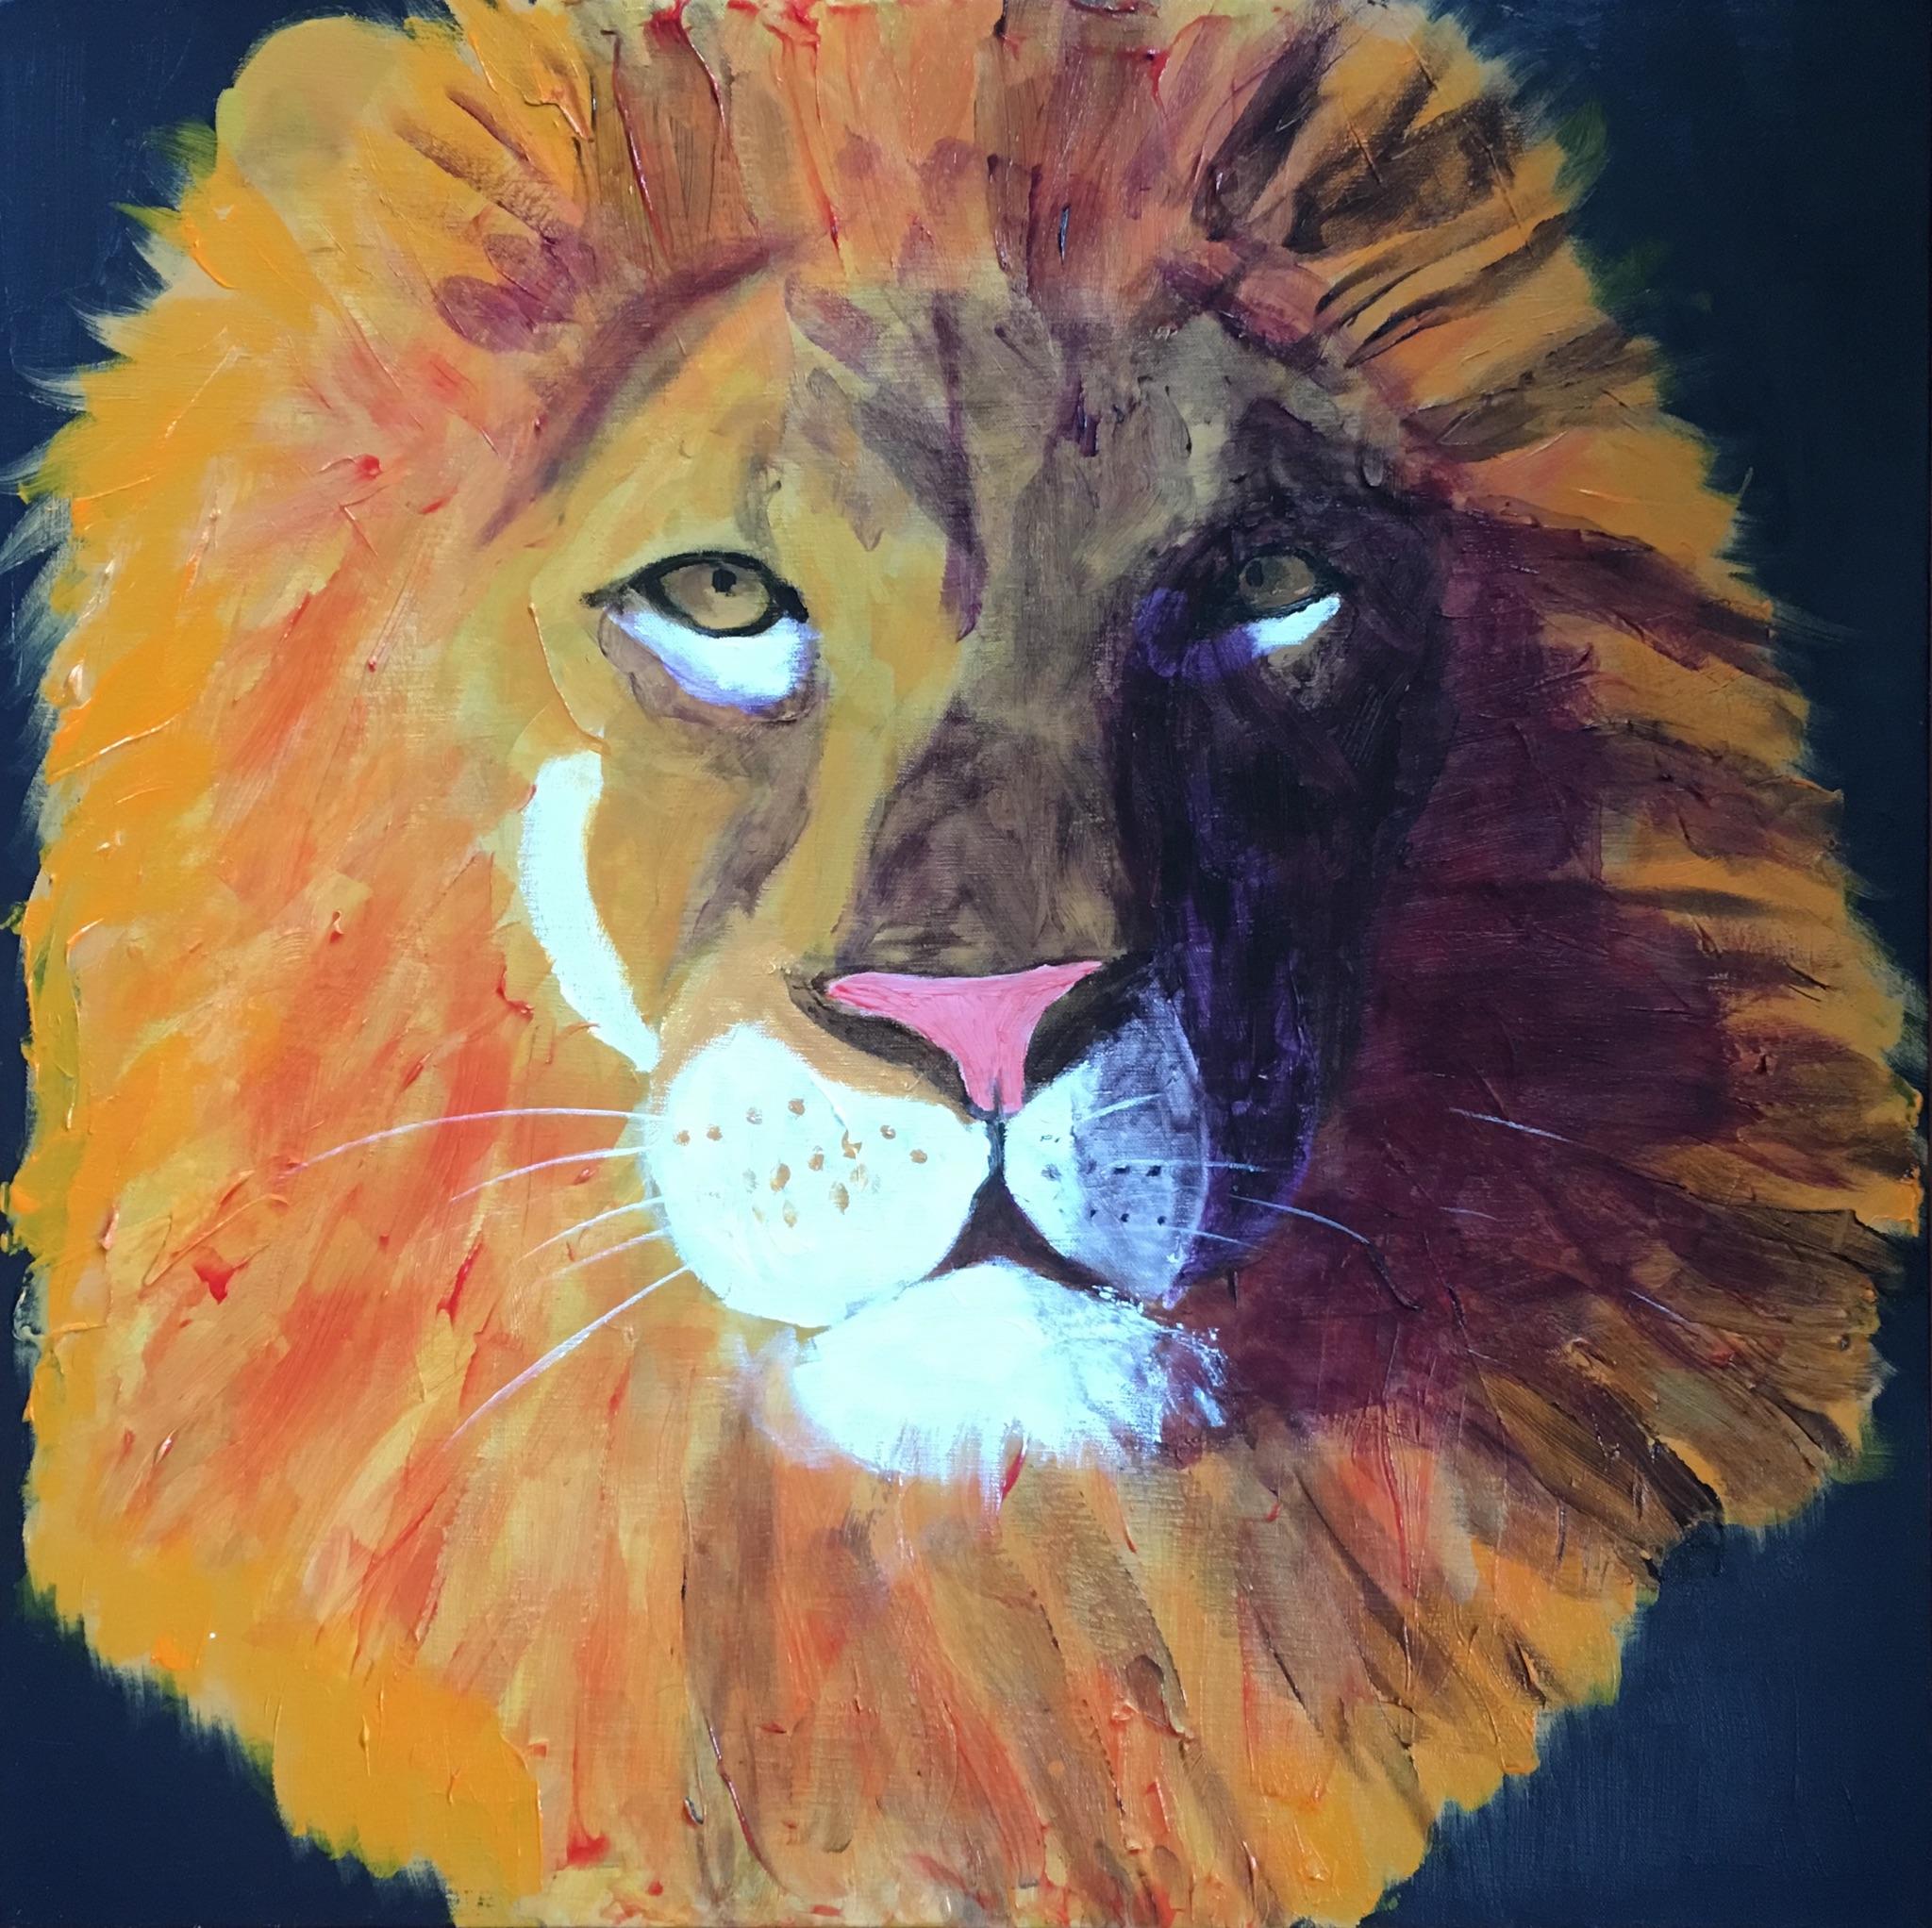 Lion King - - Original for Sale - Prints Available